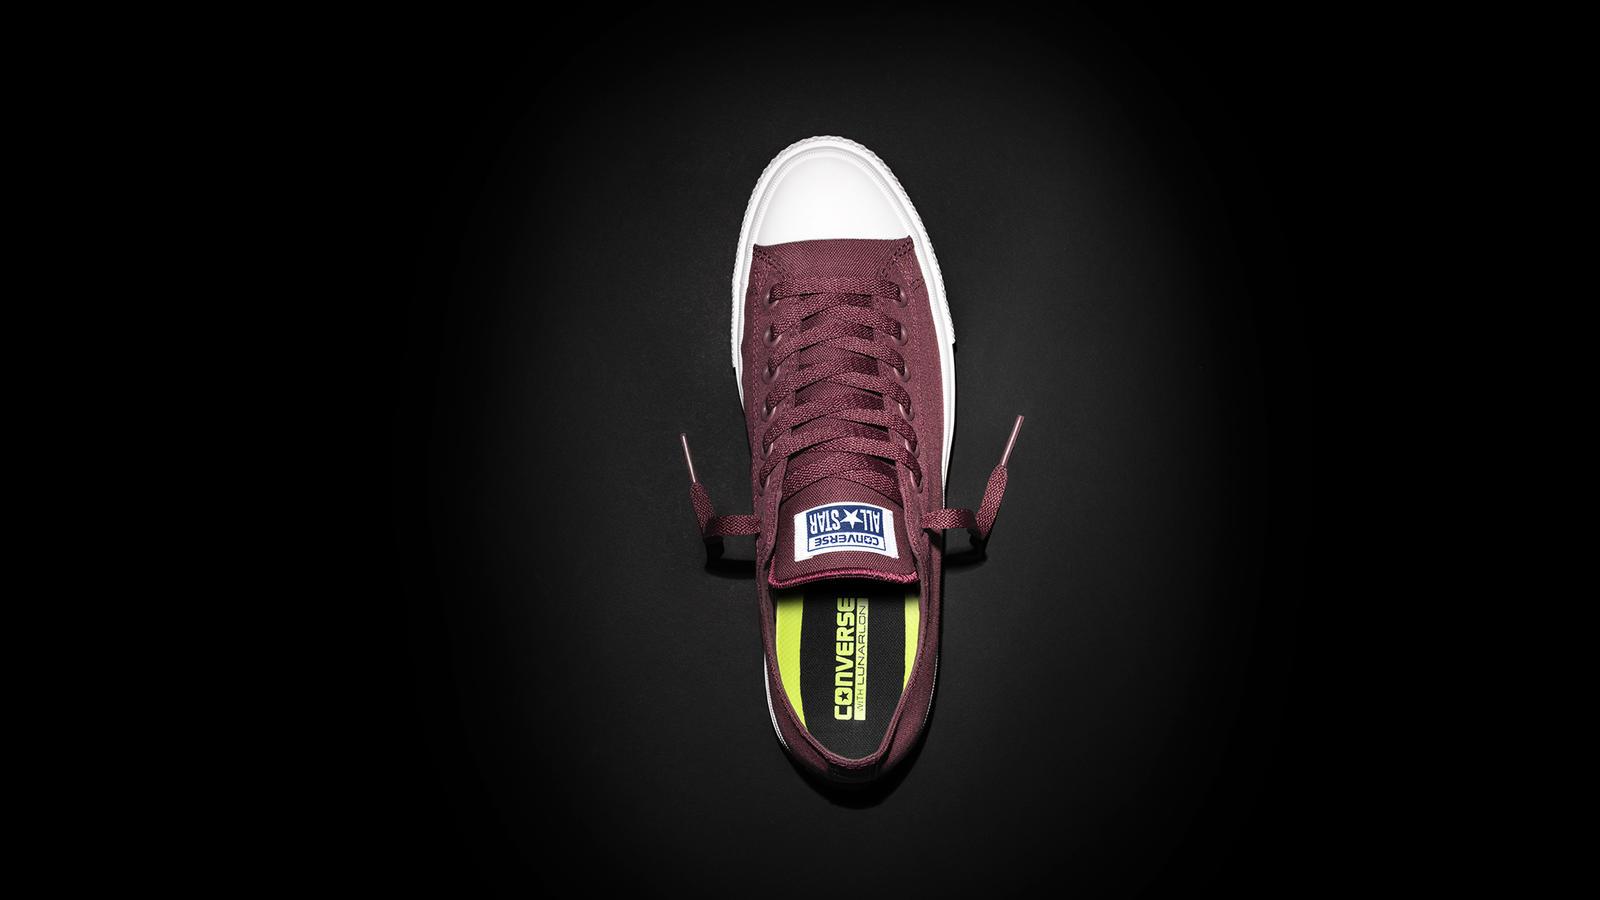 0841aad1a9e CONVERSE CHUCK TAYLOR ALL STAR II UNVEILS NEW SEASONAL COLORS - Nike ...